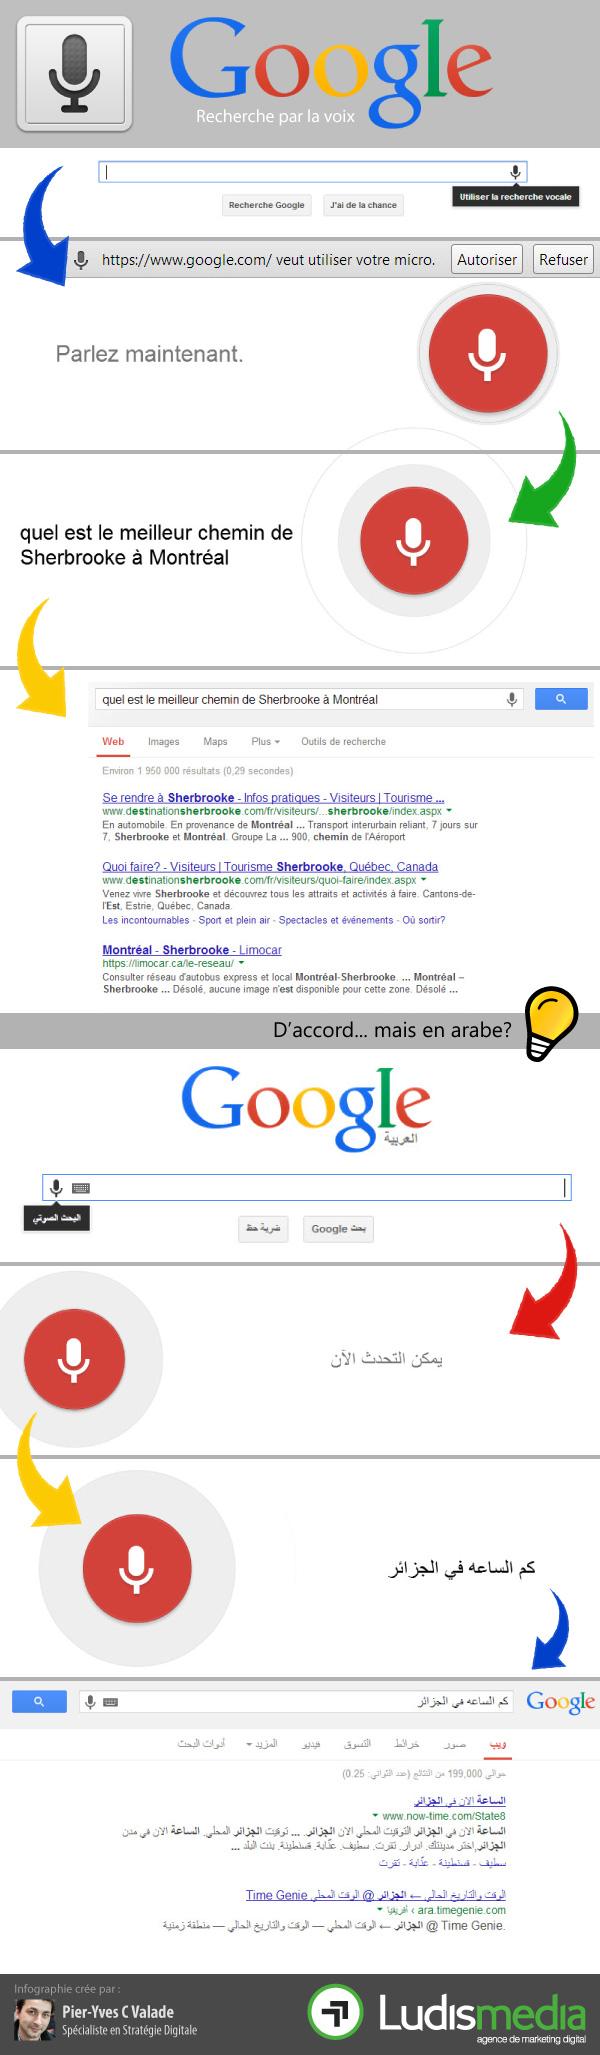 20131029_google-voice-search